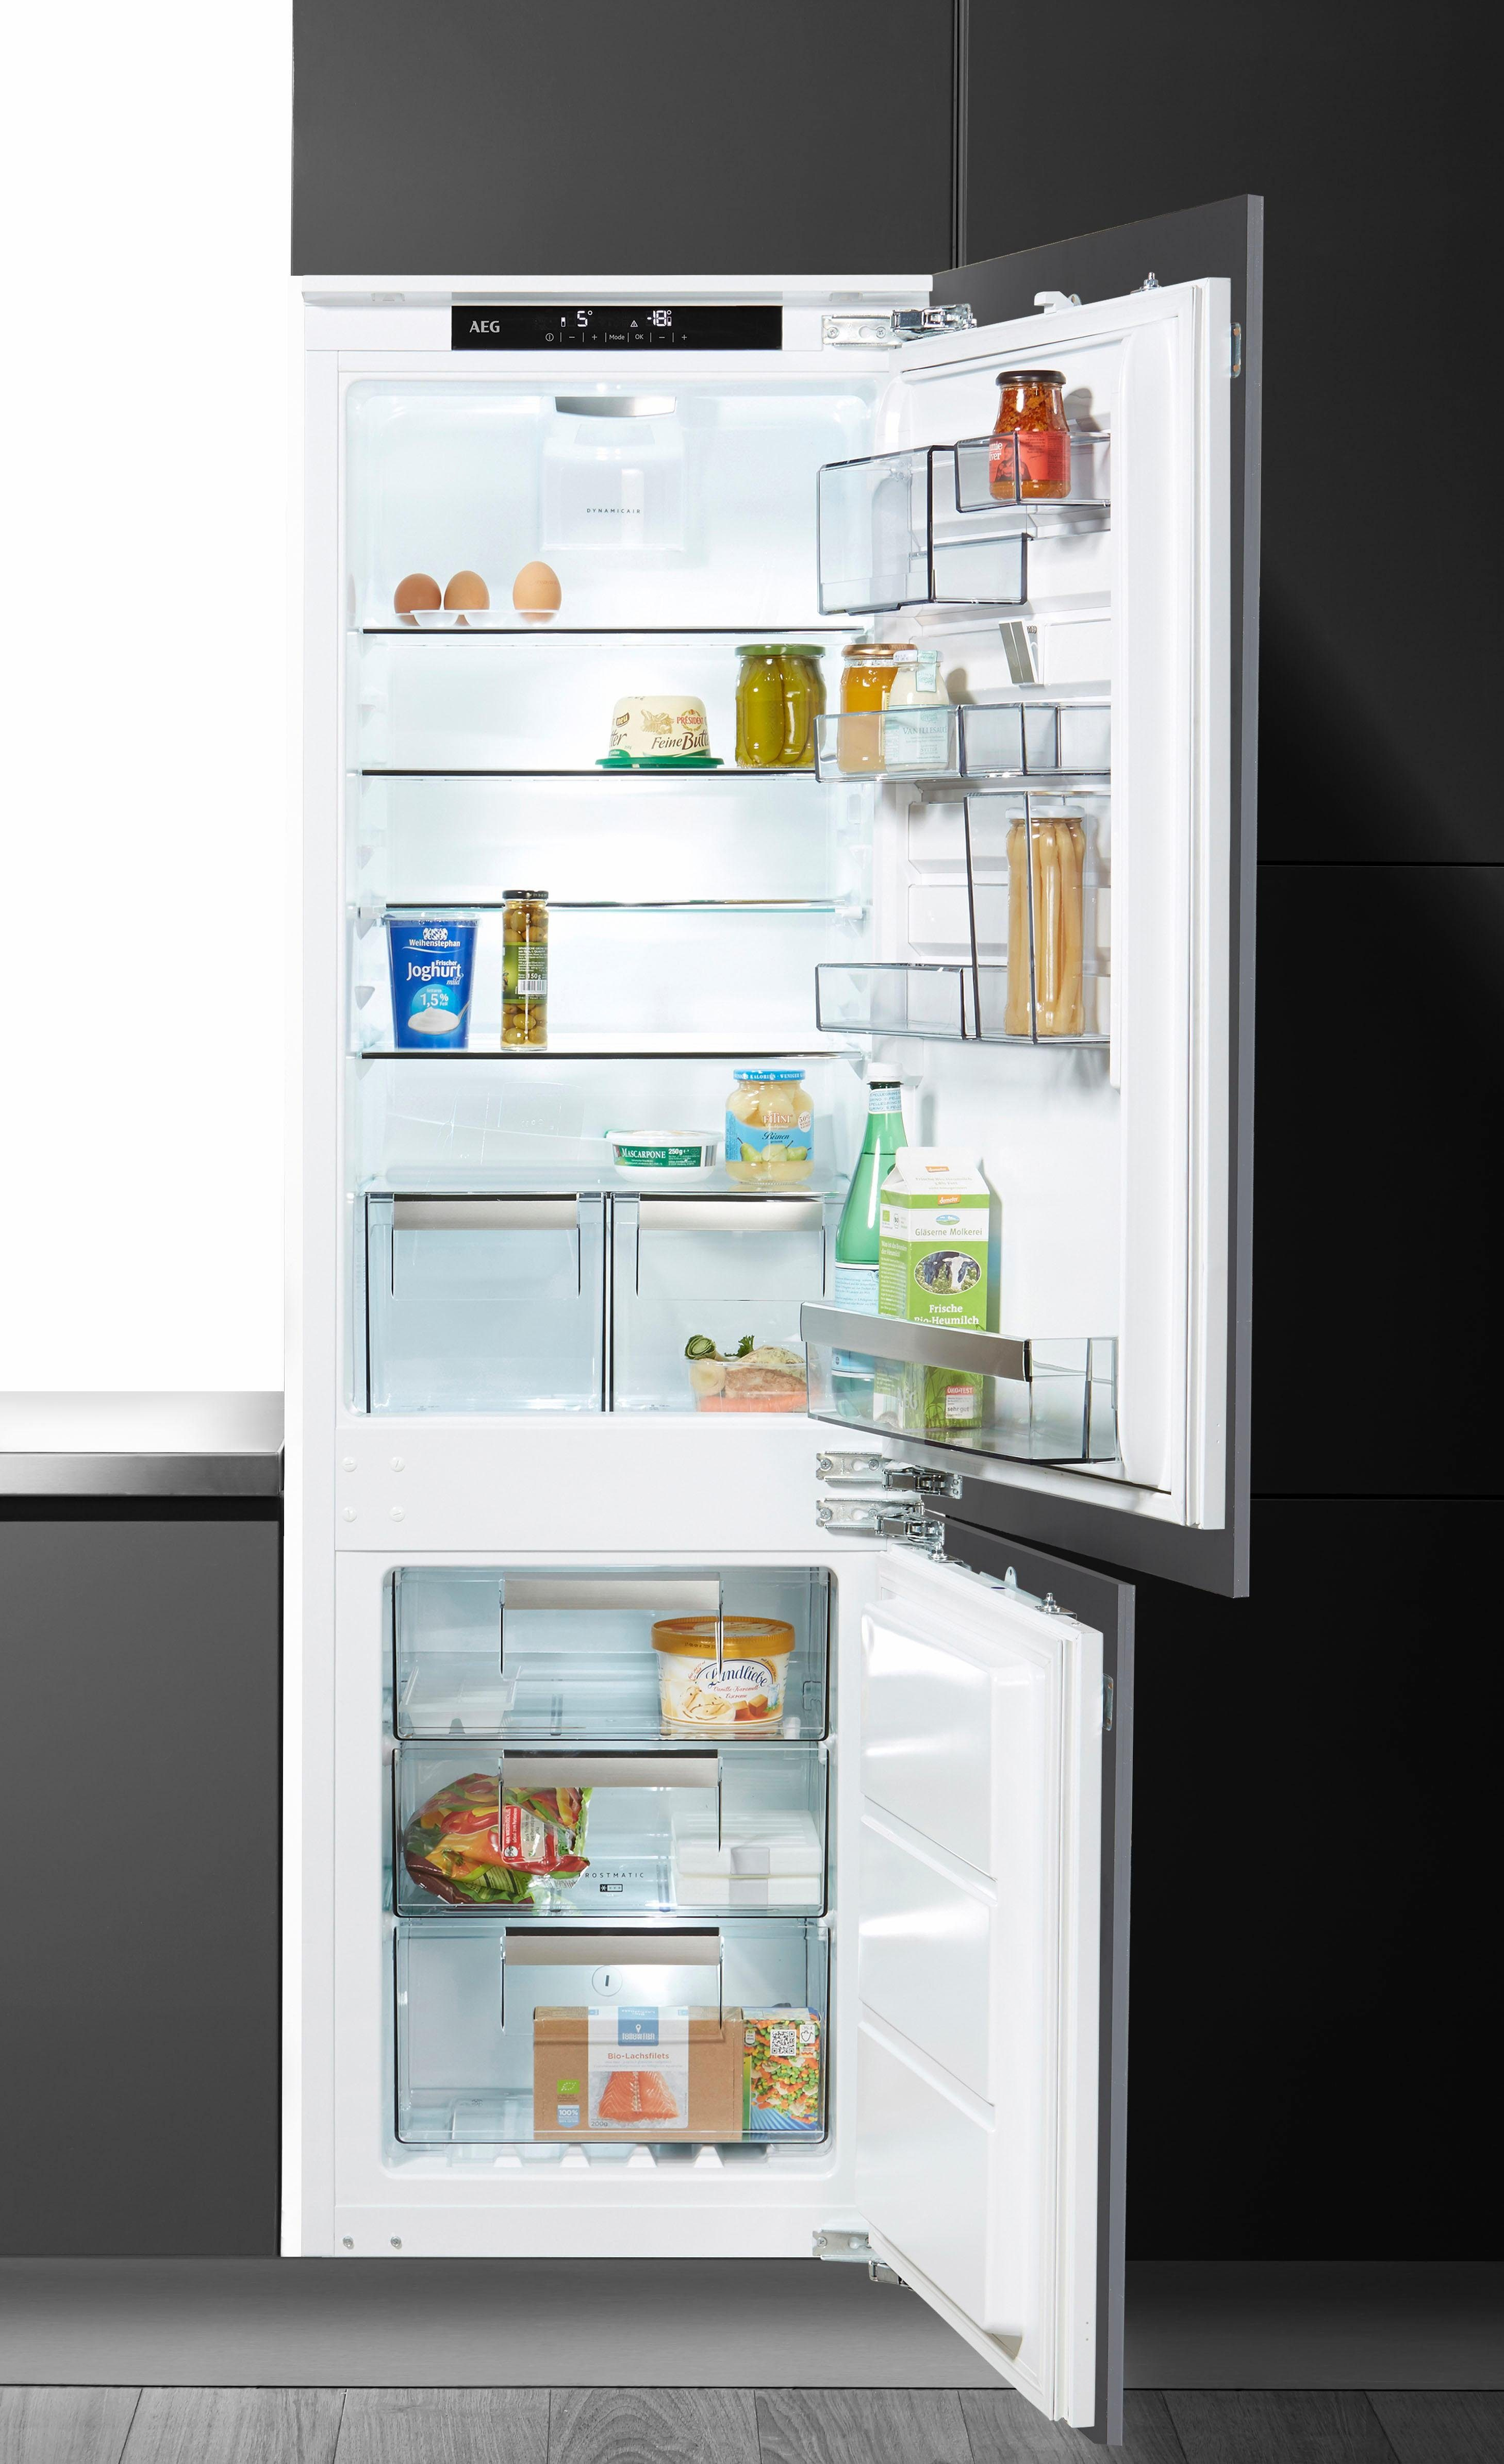 AEG integrierbarer Einbaukühlschrank SANTO SCE81864TC, Energieklasse A+++, 176,9 cm hoch